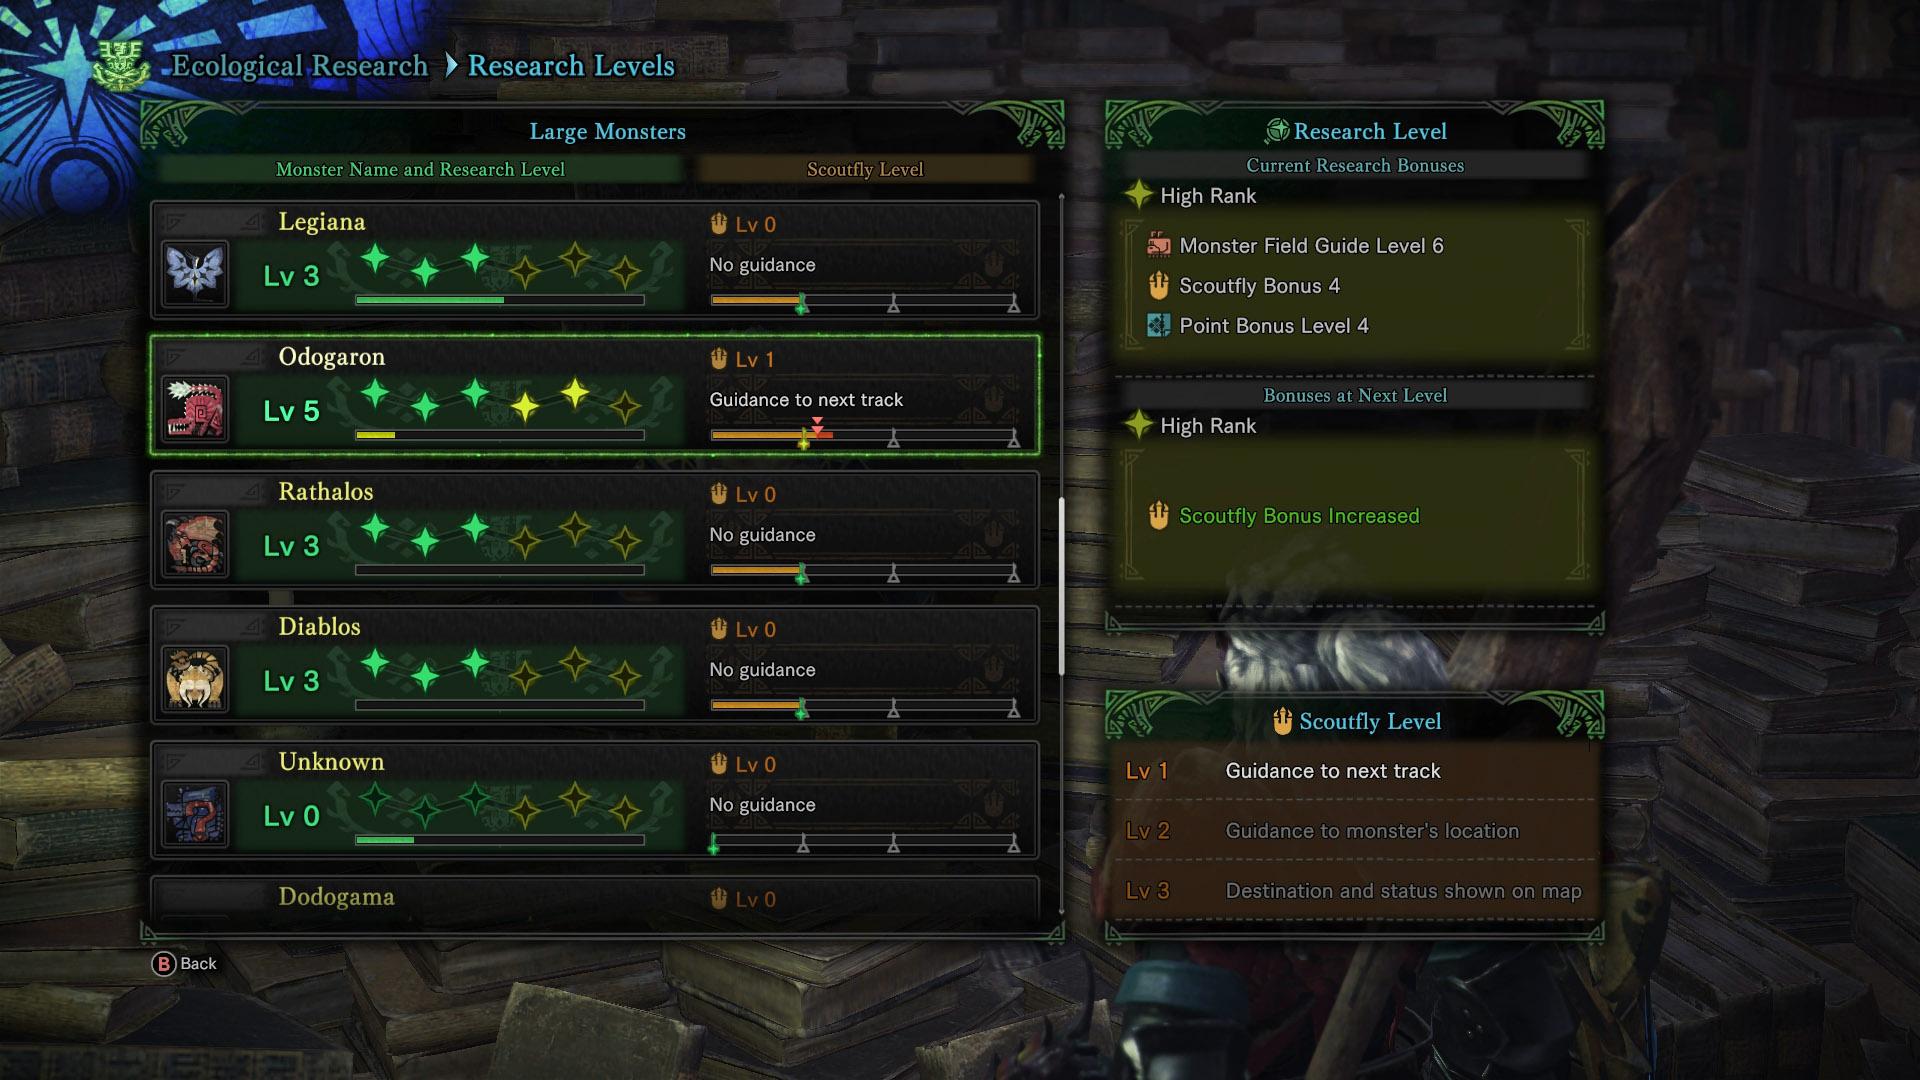 How to Unlock Rainbow Pigment in Monster Hunter World | Shacknews